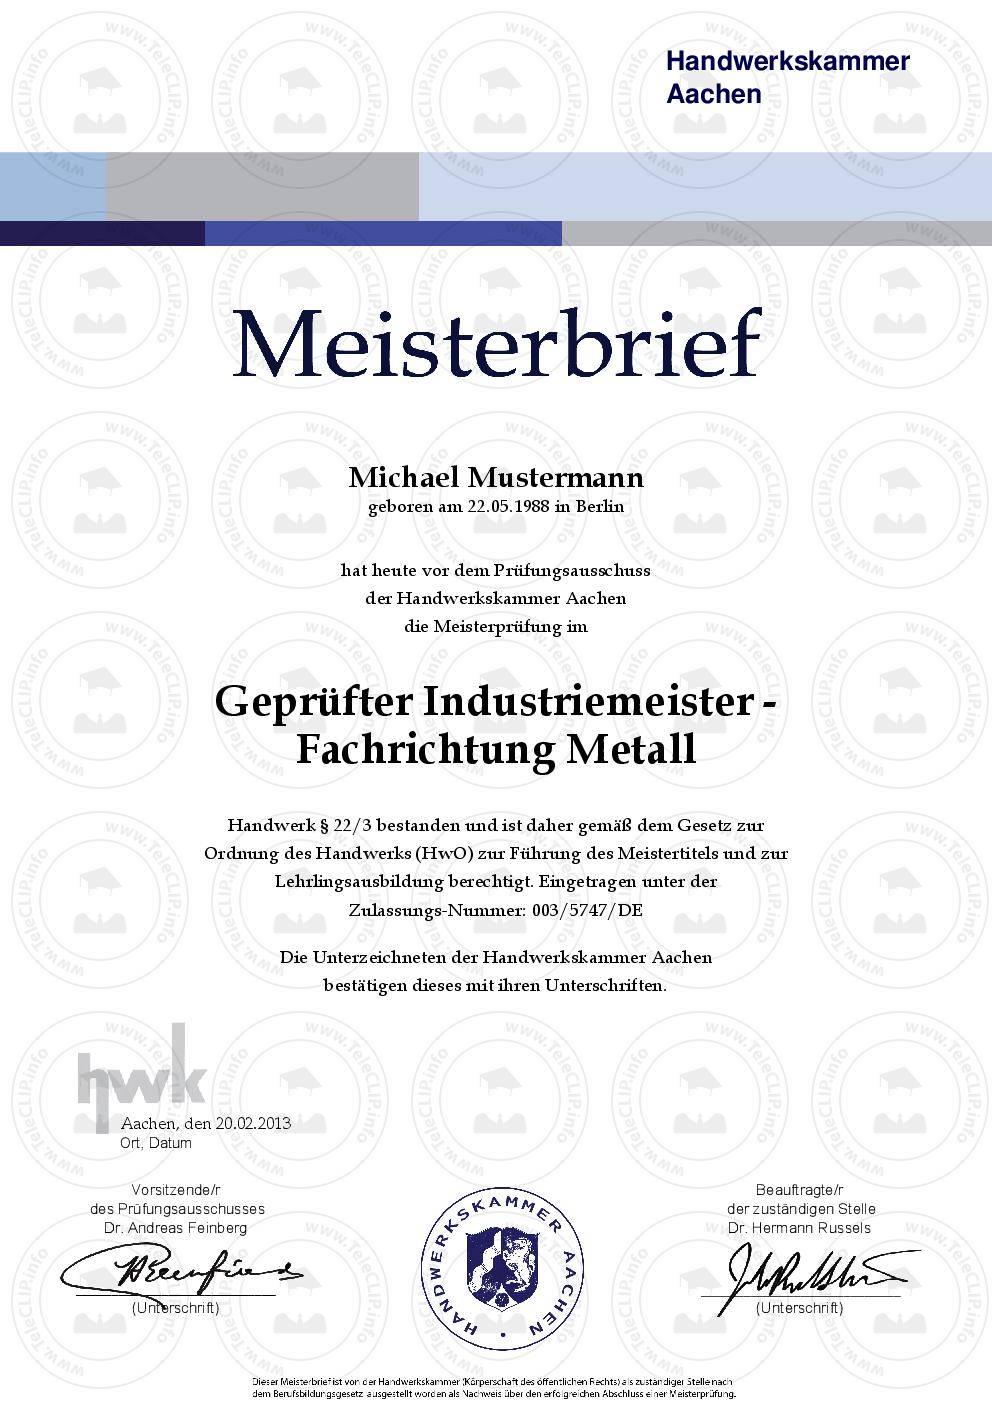 hwk_meisterbrief_5b